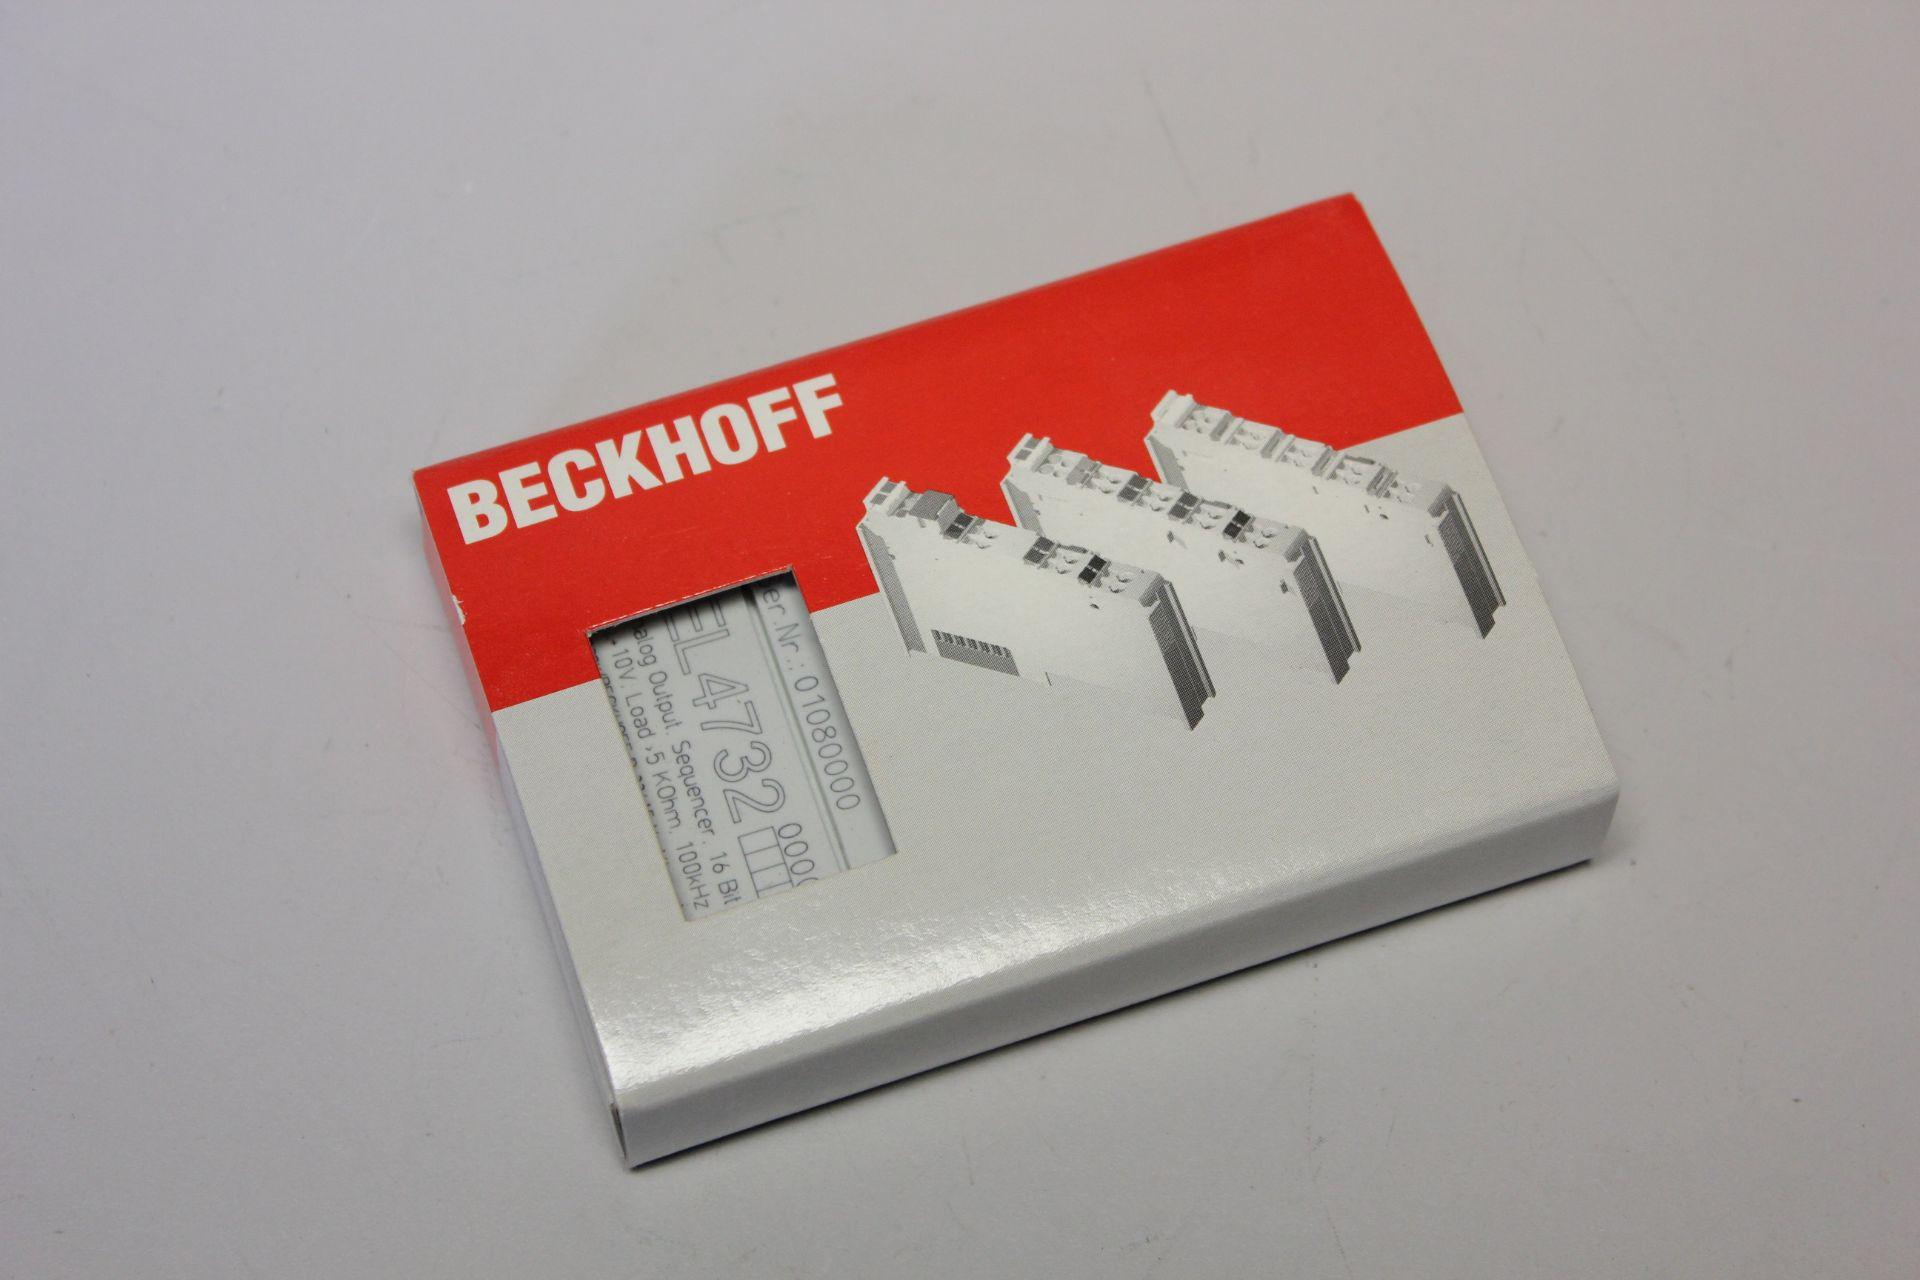 NEW BECKHOFF I/O MODULE